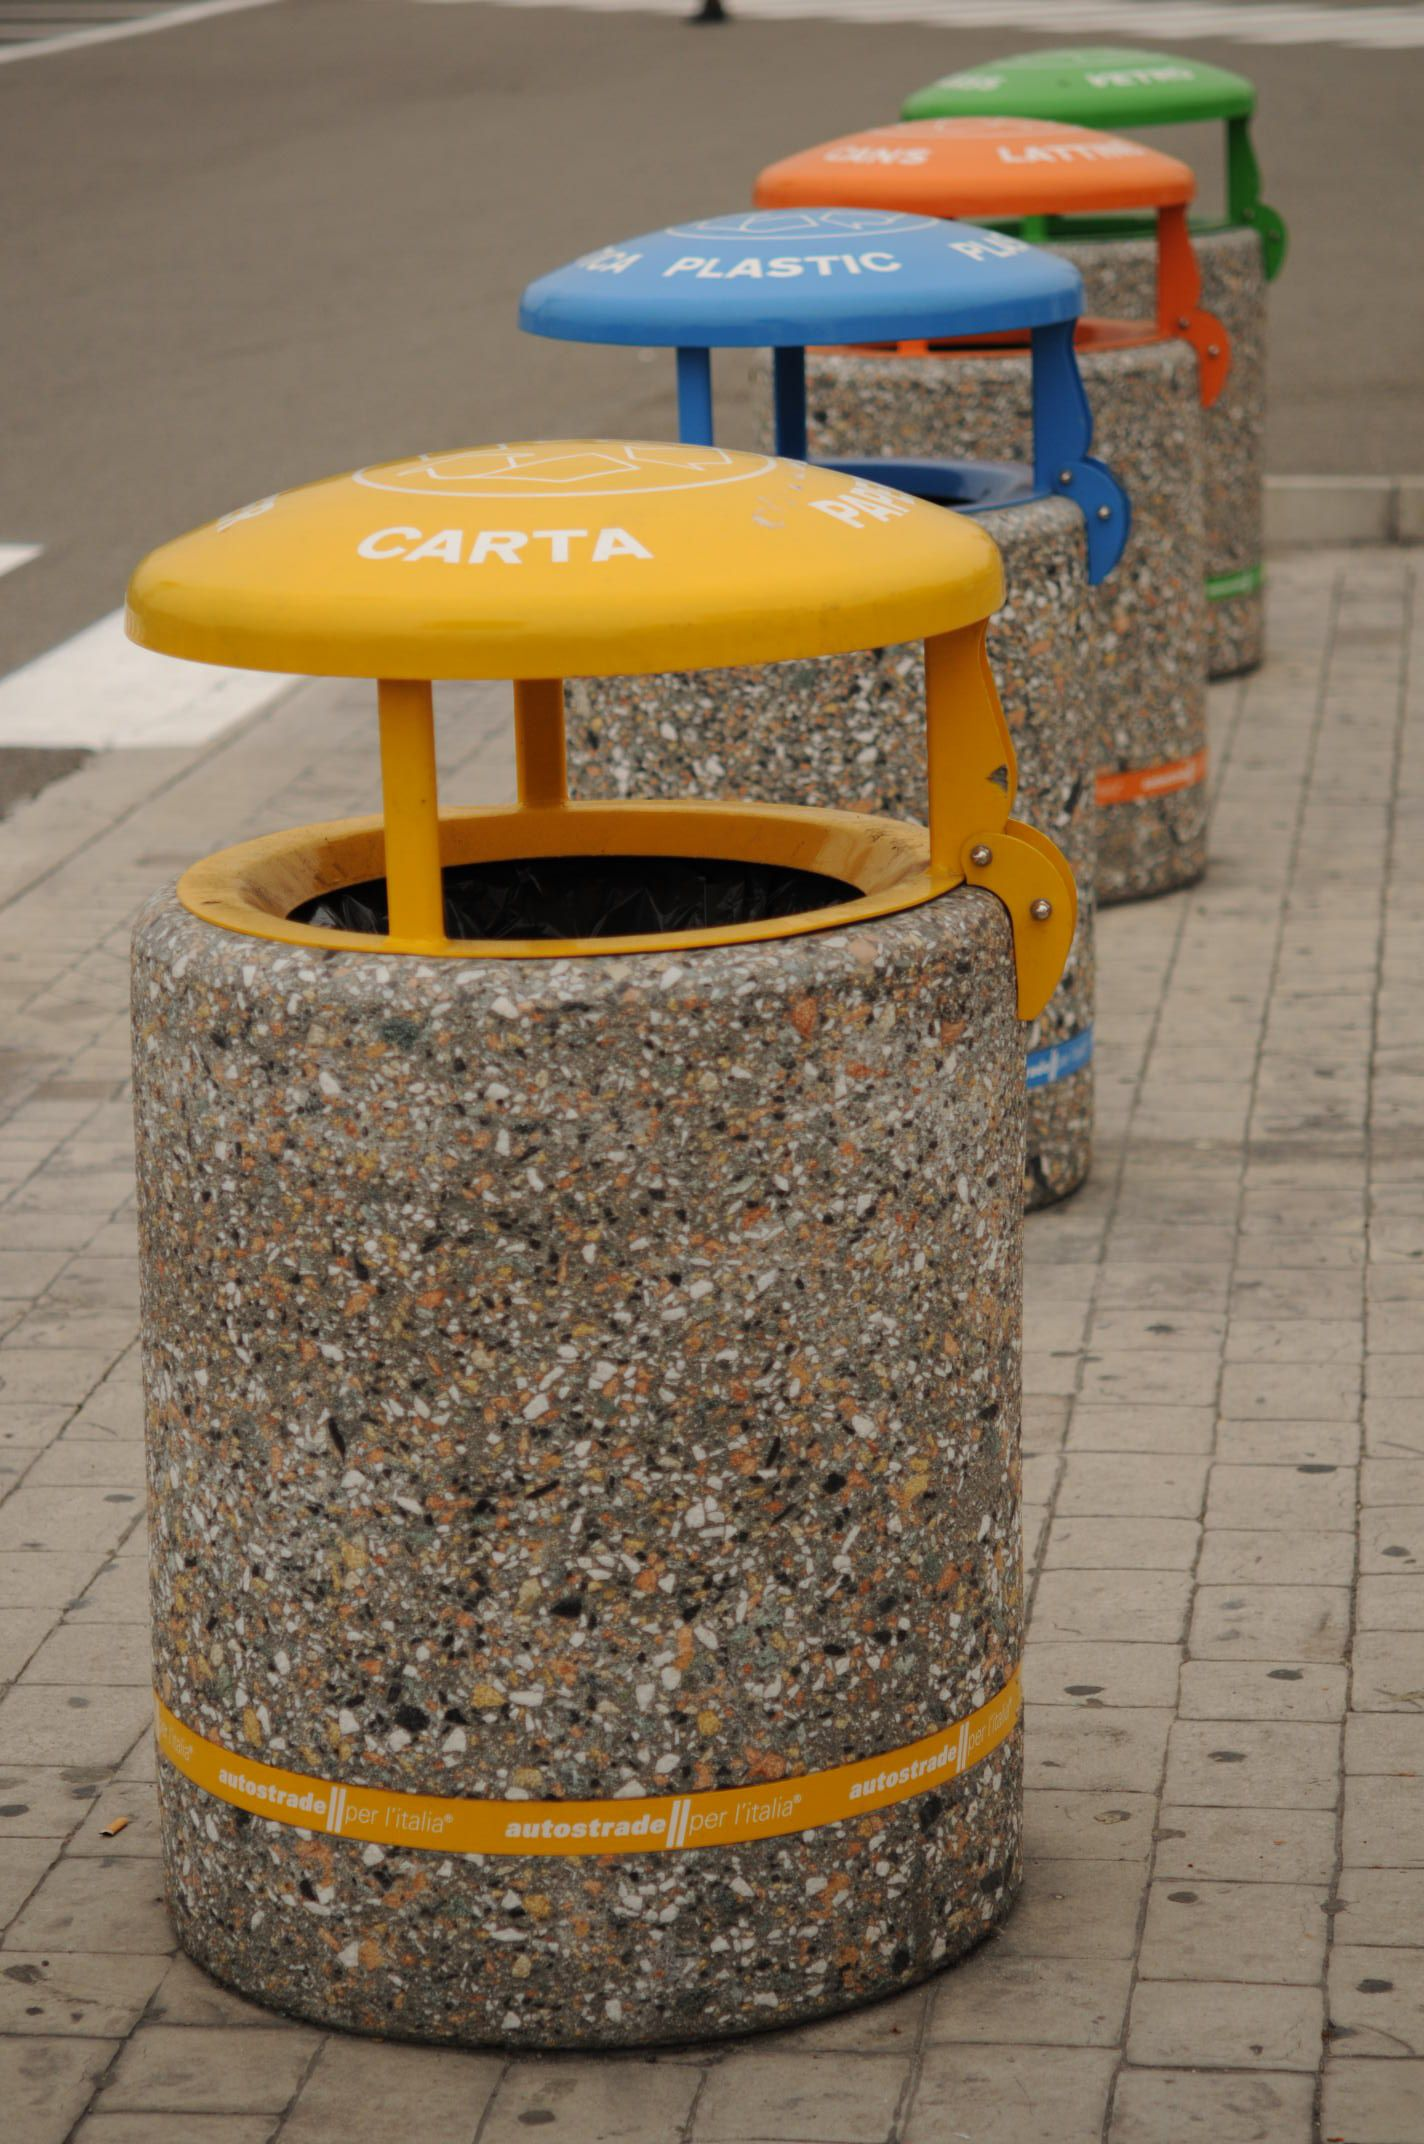 Recycling sustainability by bellitalia street furnitrure for Bellitalia arredo urbano